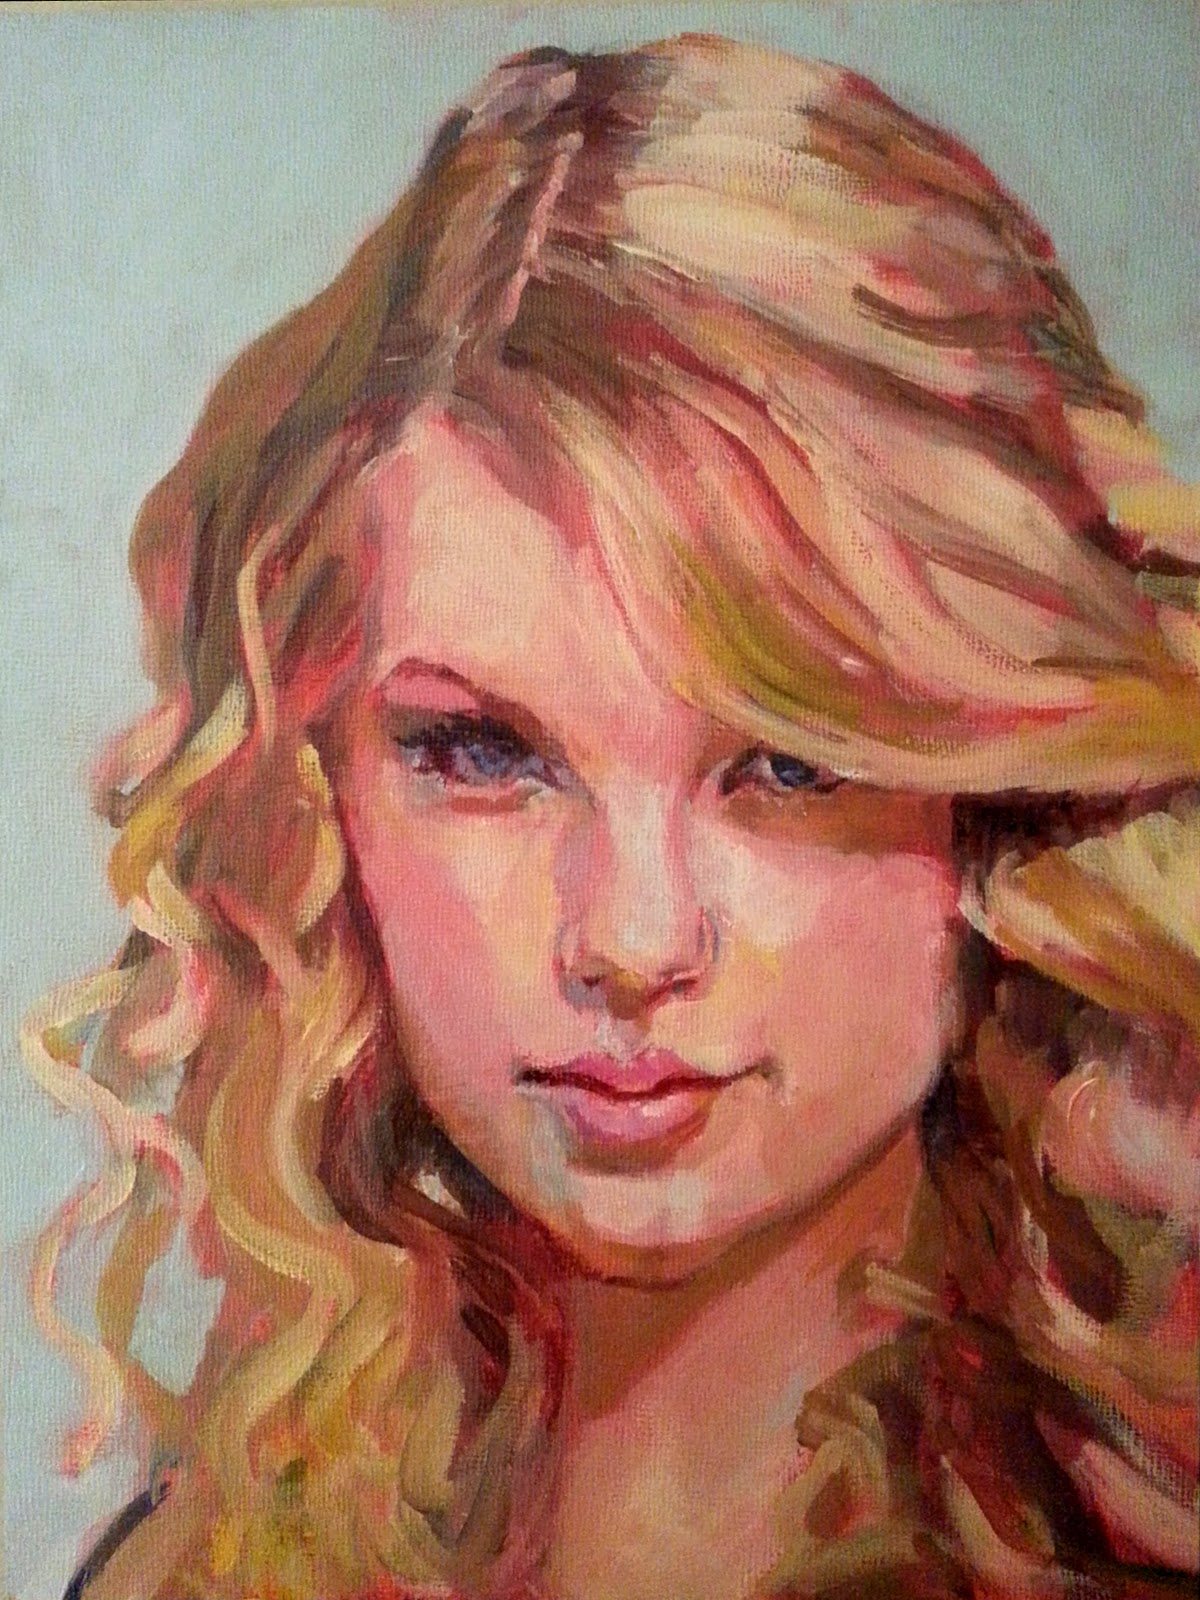 http://1.bp.blogspot.com/-HWoMYmyDDjk/ULRxyFILFvI/AAAAAAAAdEc/94zIH7oh-eY/s1600/taylorswift+paint2.jpg